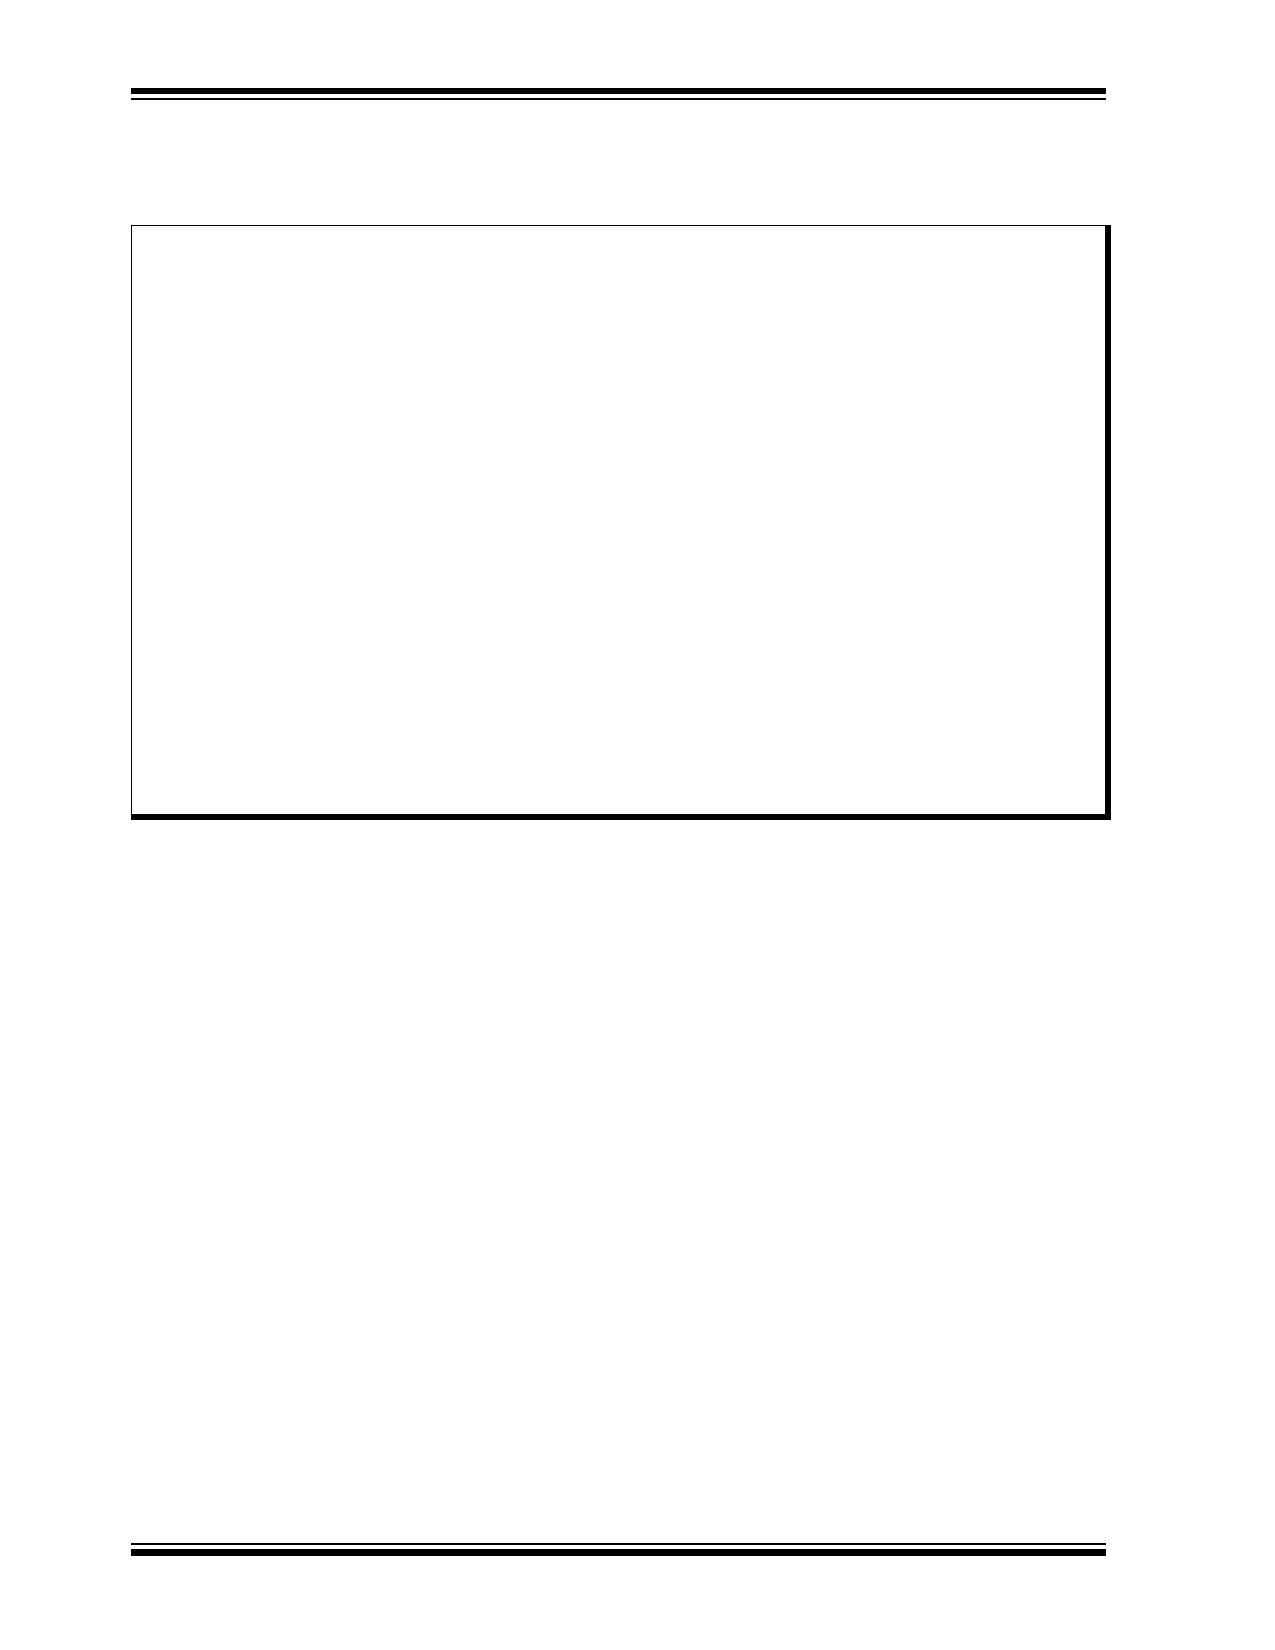 SST12CP33 pdf, equivalent, schematic